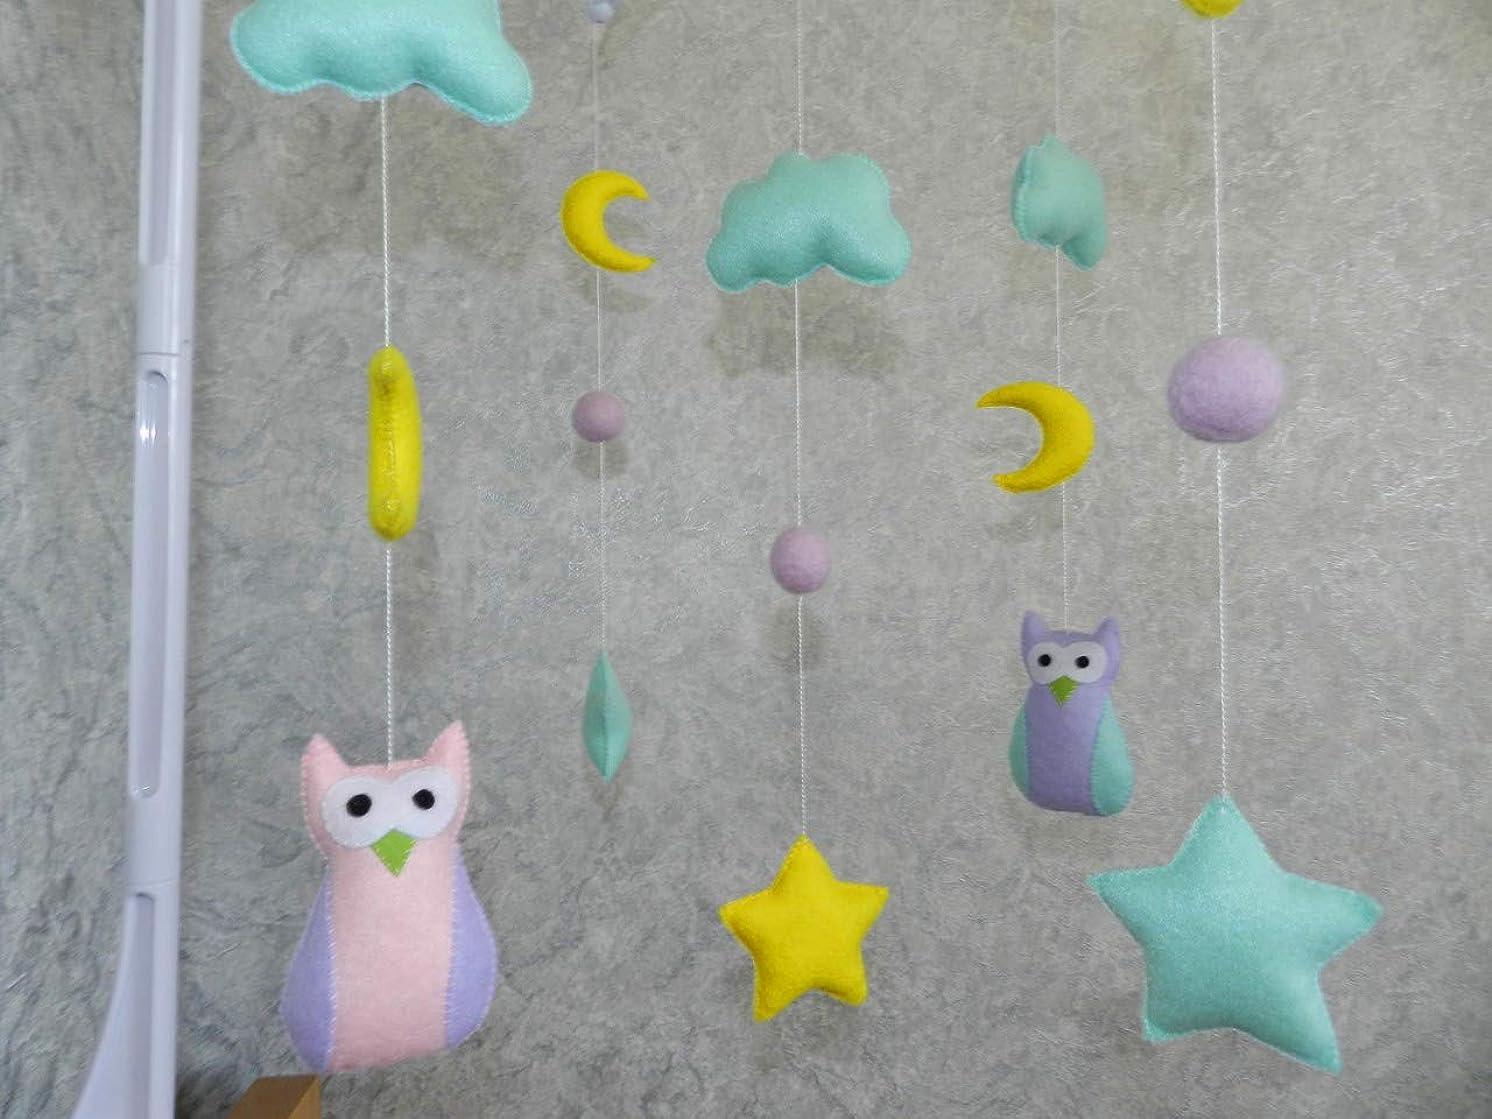 Handmade Nursery Crib Mobile | Felt Crib Mobile for Boys and Girls, Made with Love (Owls-2)